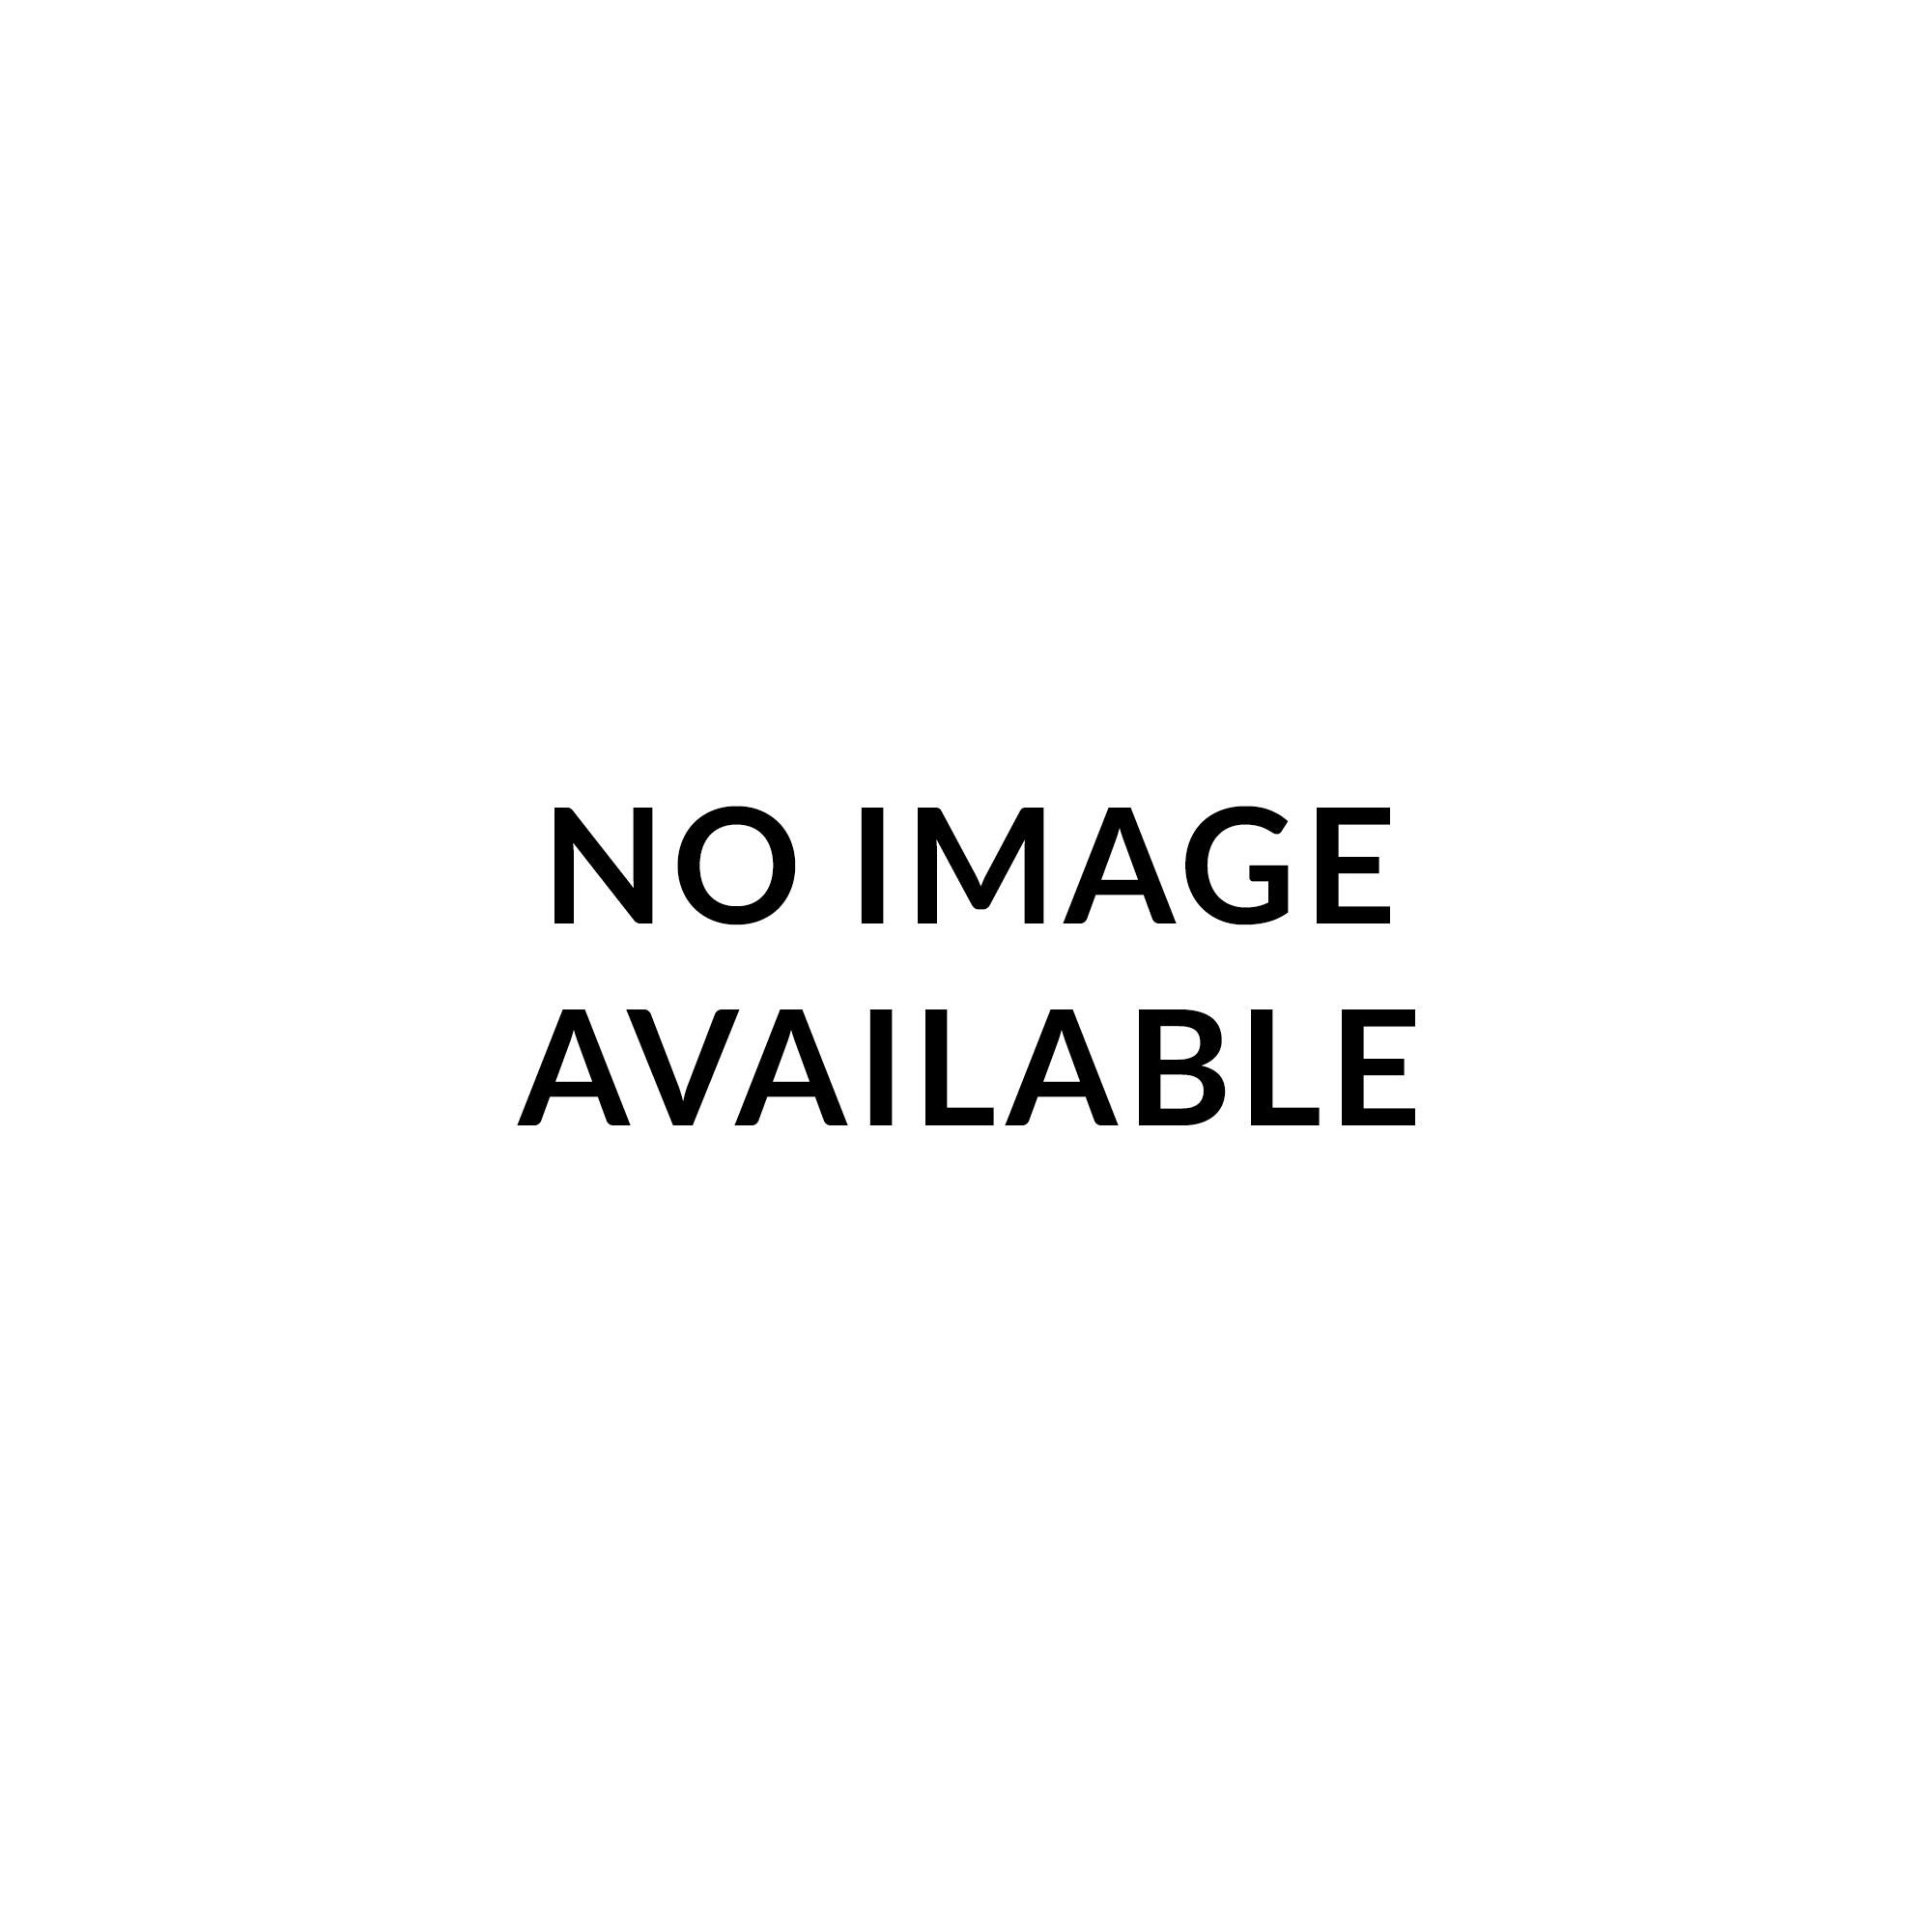 D'Addario PSB110SL ProSteels XL Bass Single String .110 Super Long Scale